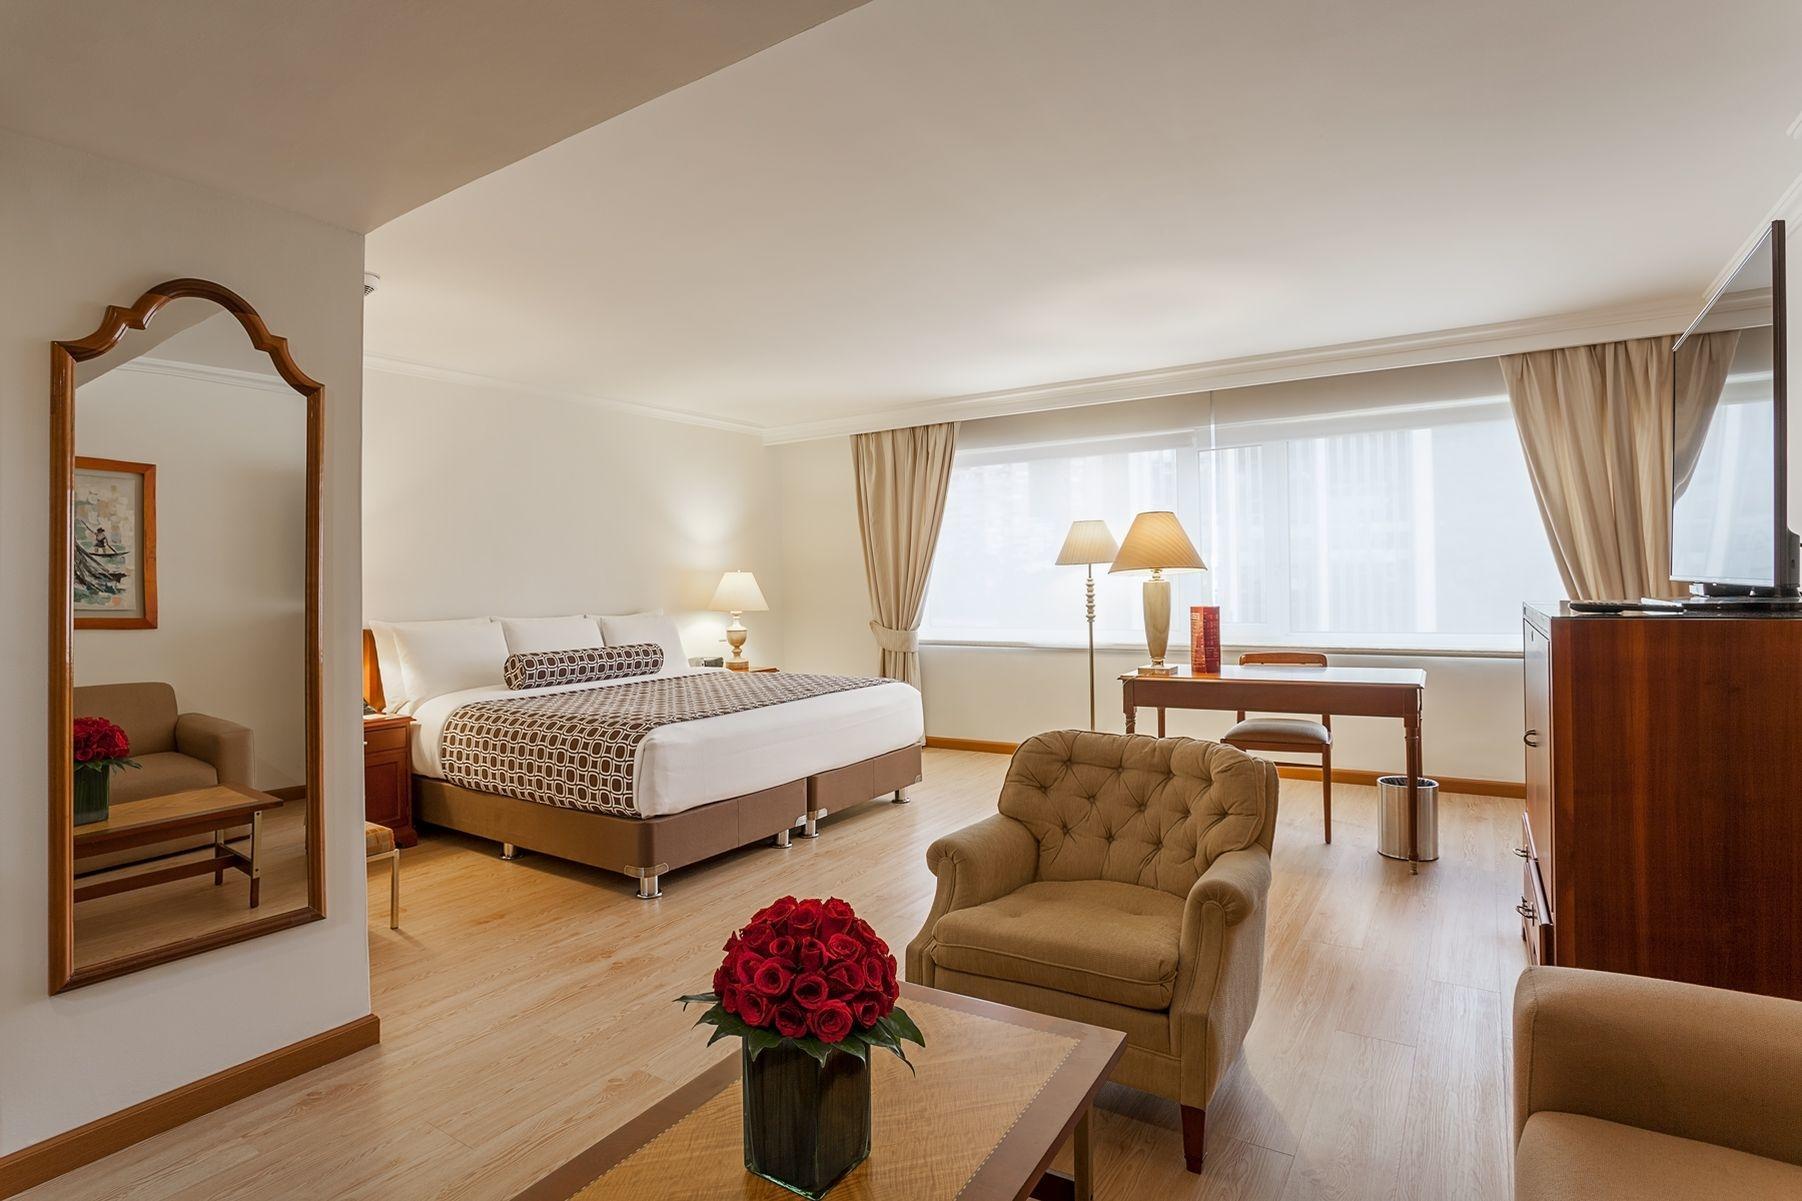 Hotel Tequendama de Bogotá se convertirá en Four Points By Sheraton